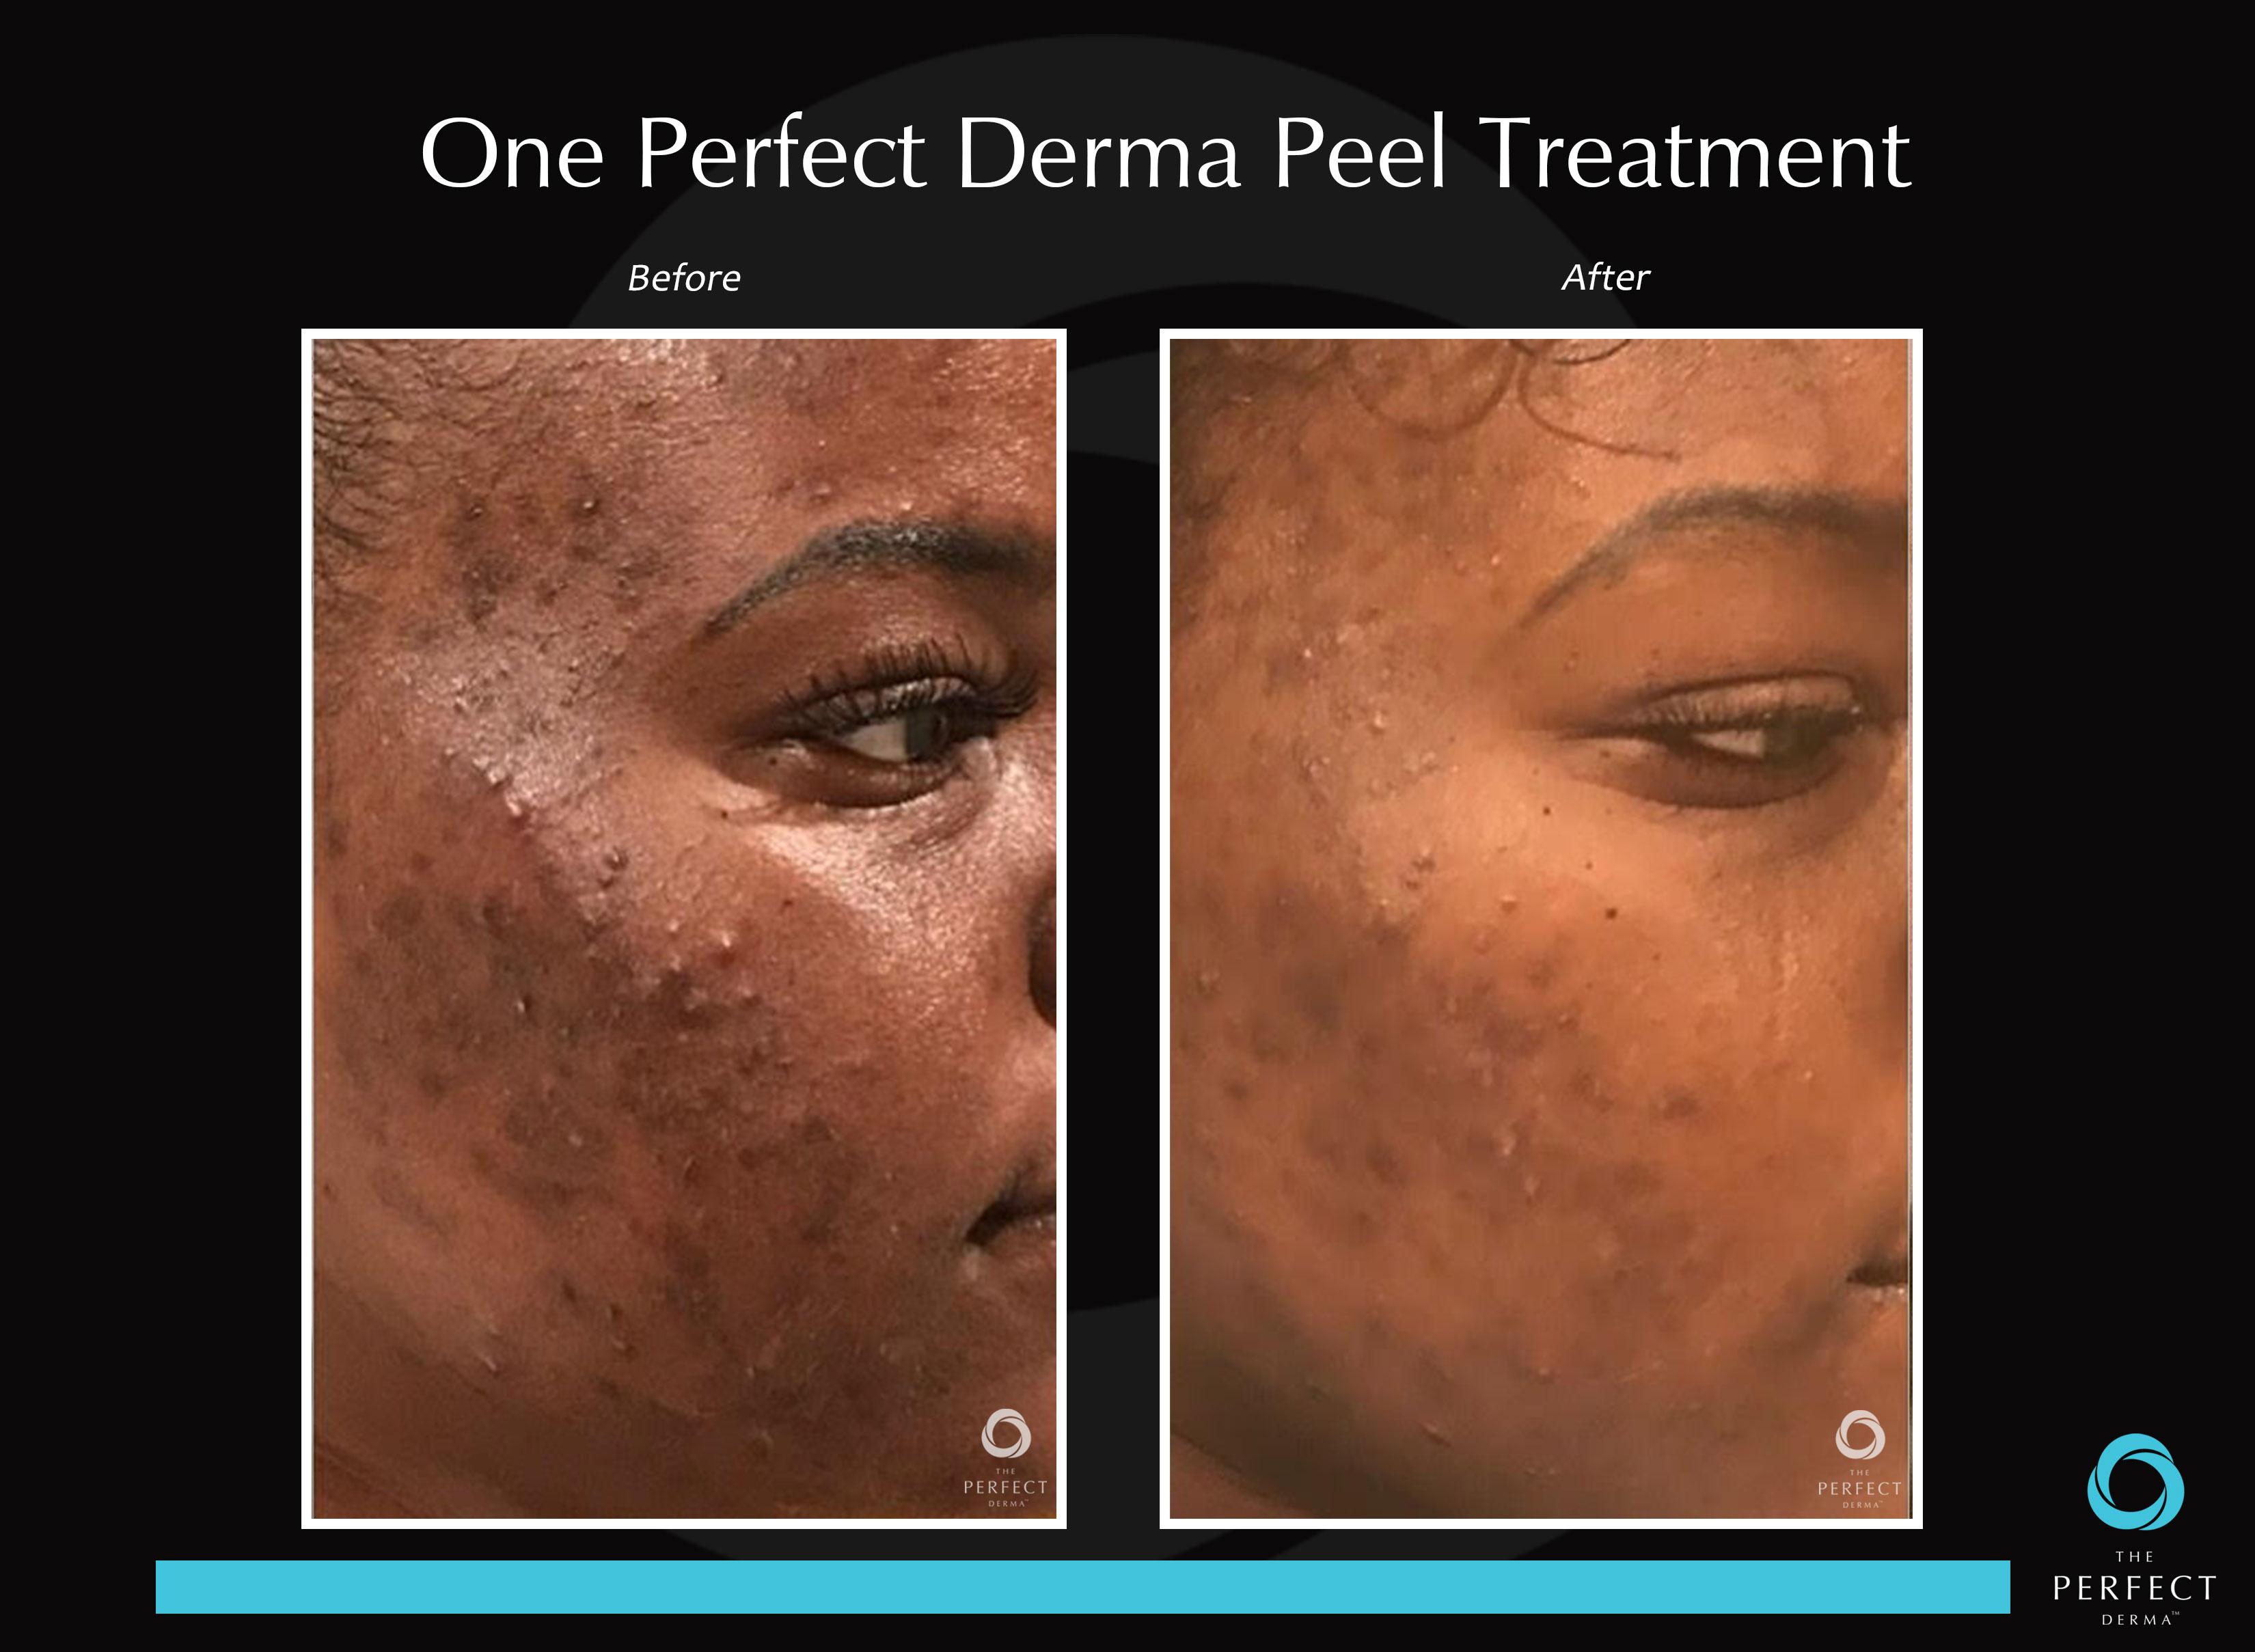 The Perfect Derma Peel